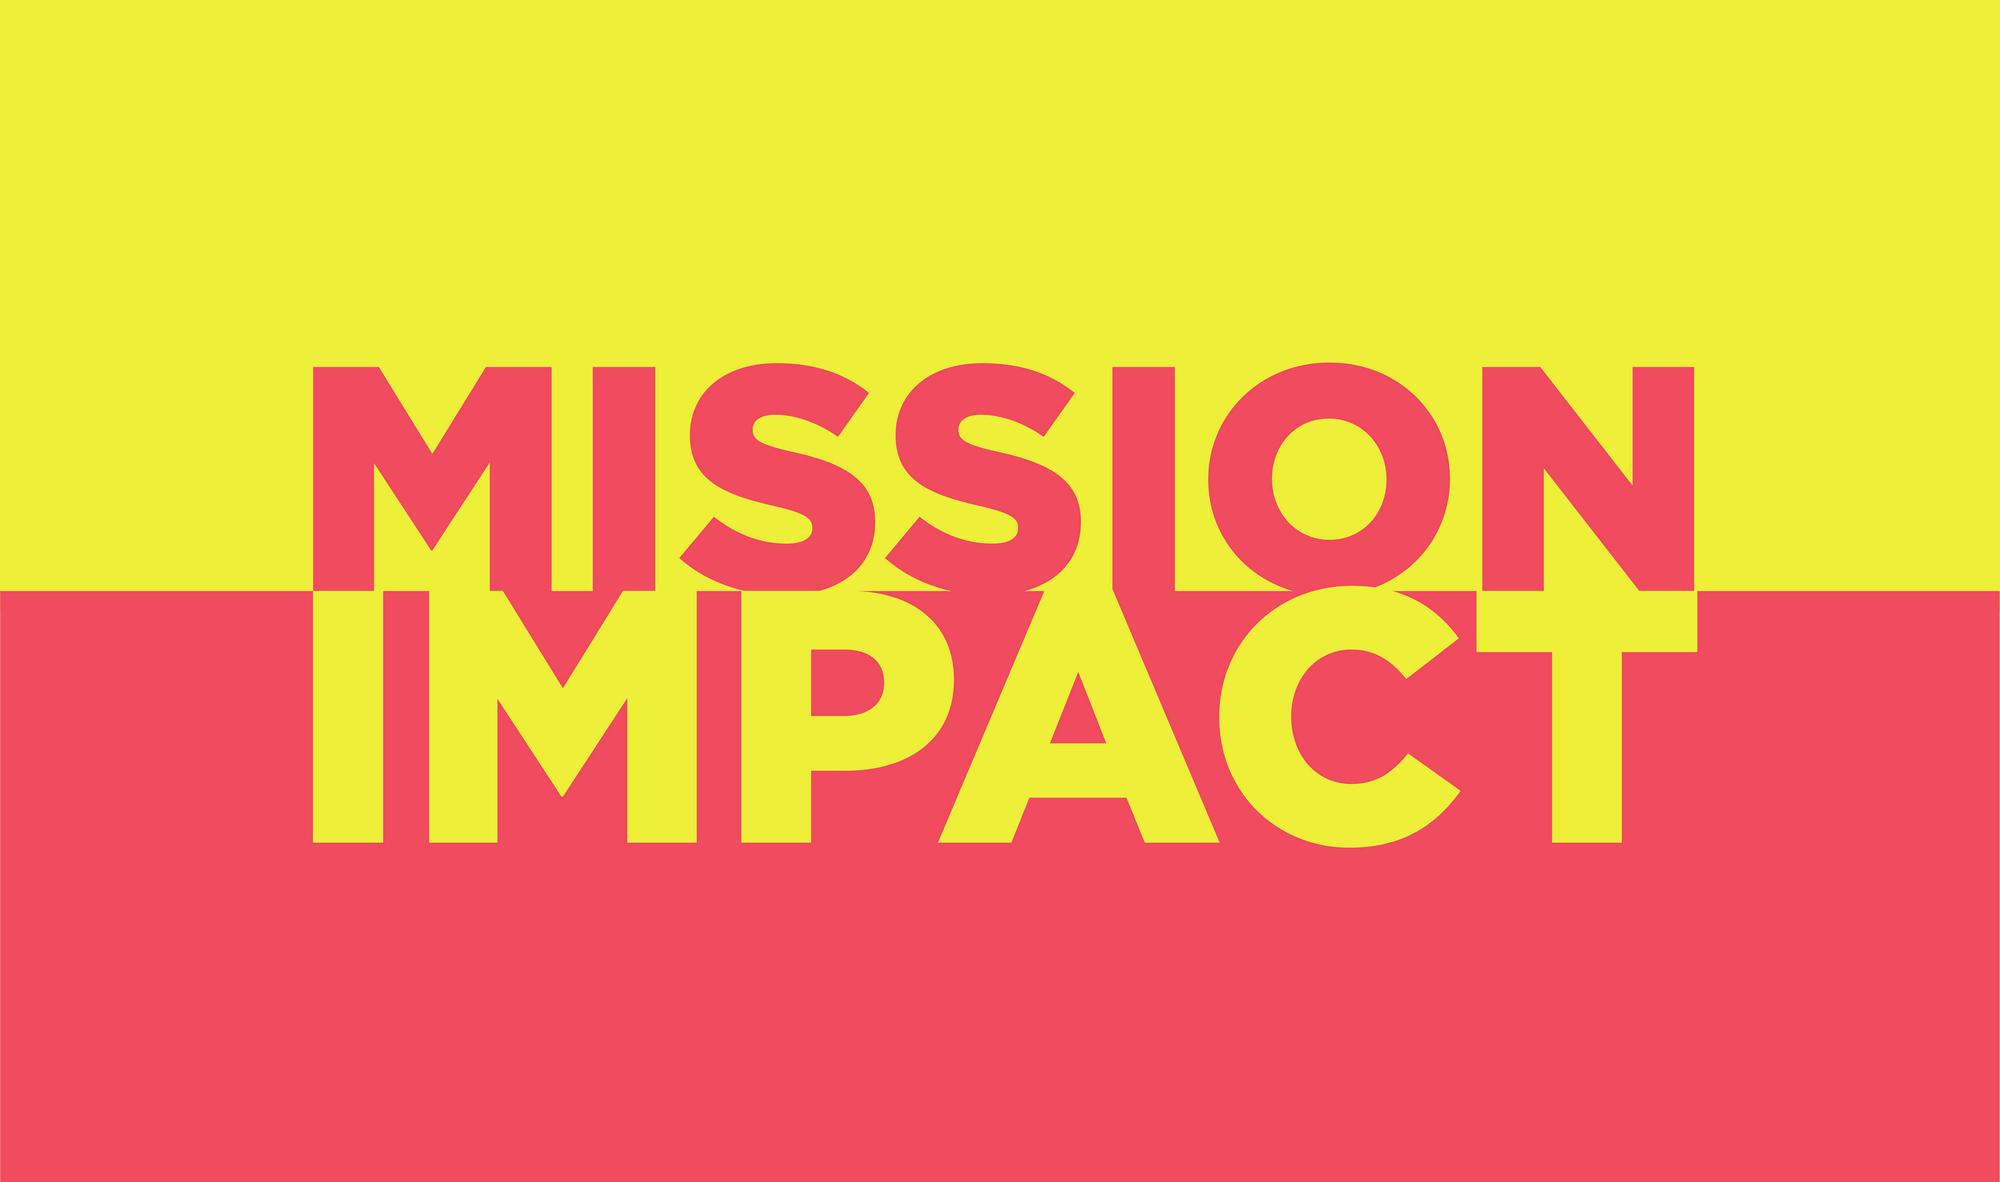 MISSION IMPACT